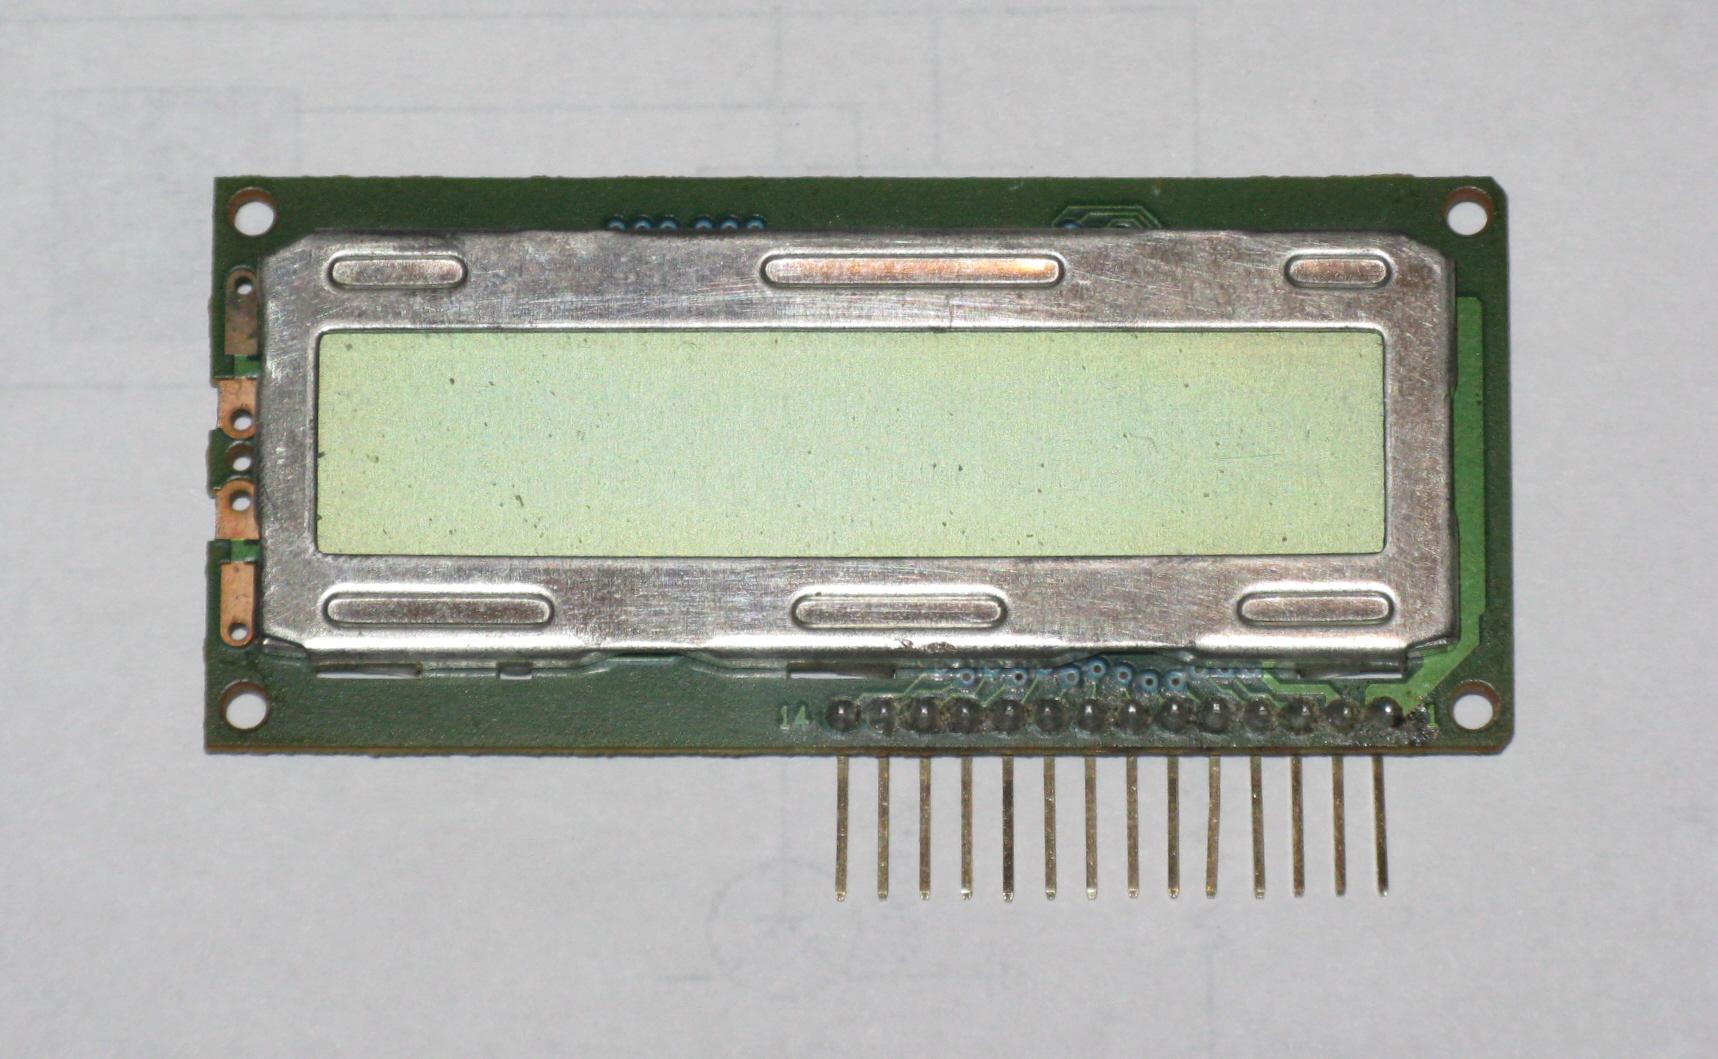 Pinning Liquid Crystal Displays